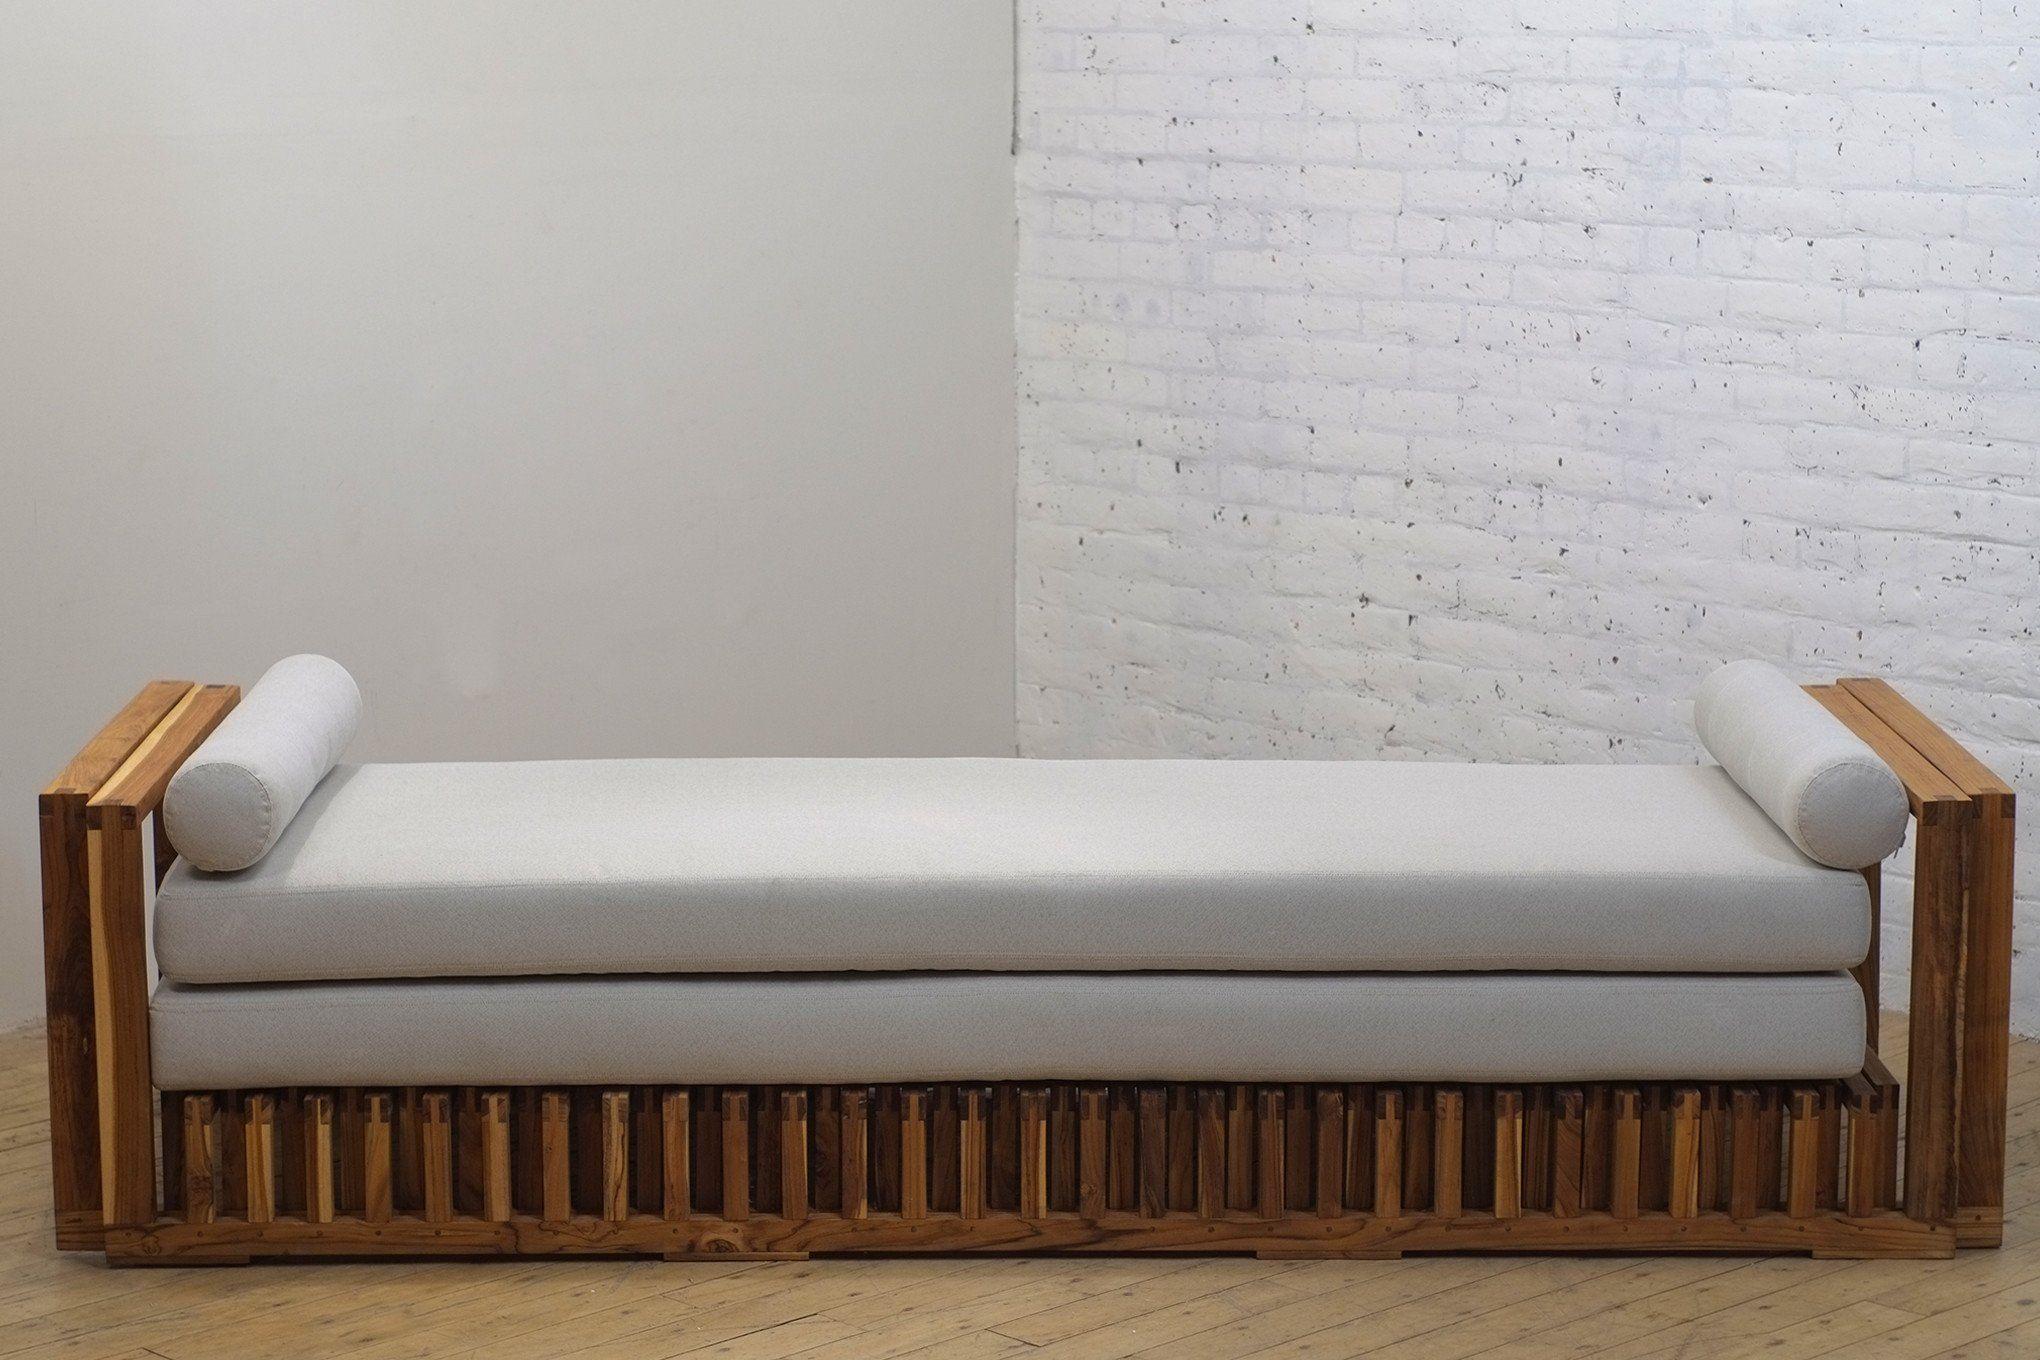 Rekal Daybed Wood Bed Design Luxury Bedroom Furniture Daybed